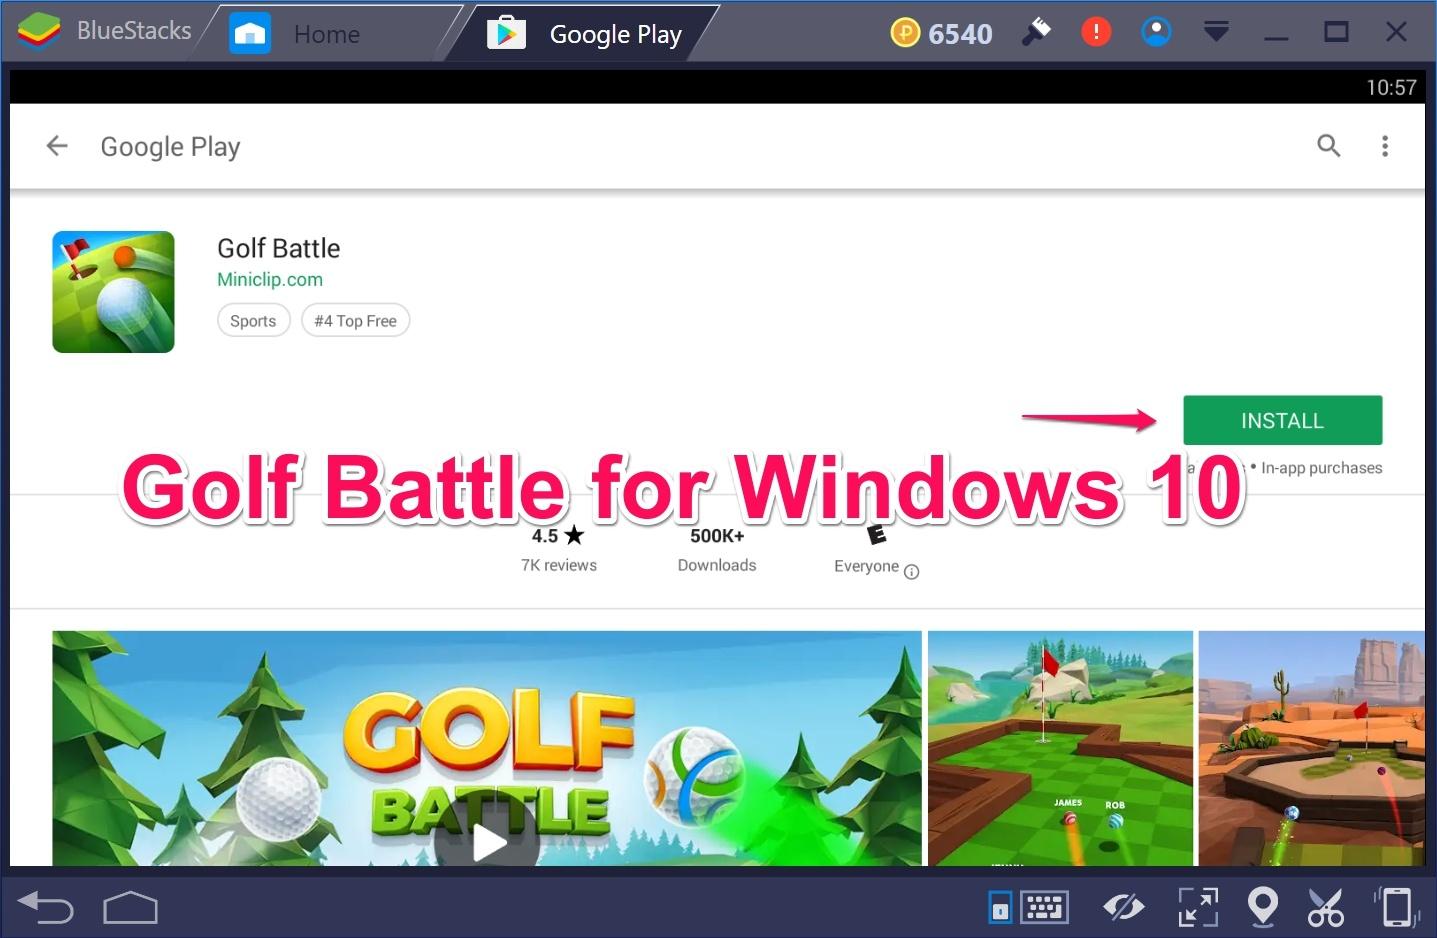 Golf Battles for Windows 10 PC